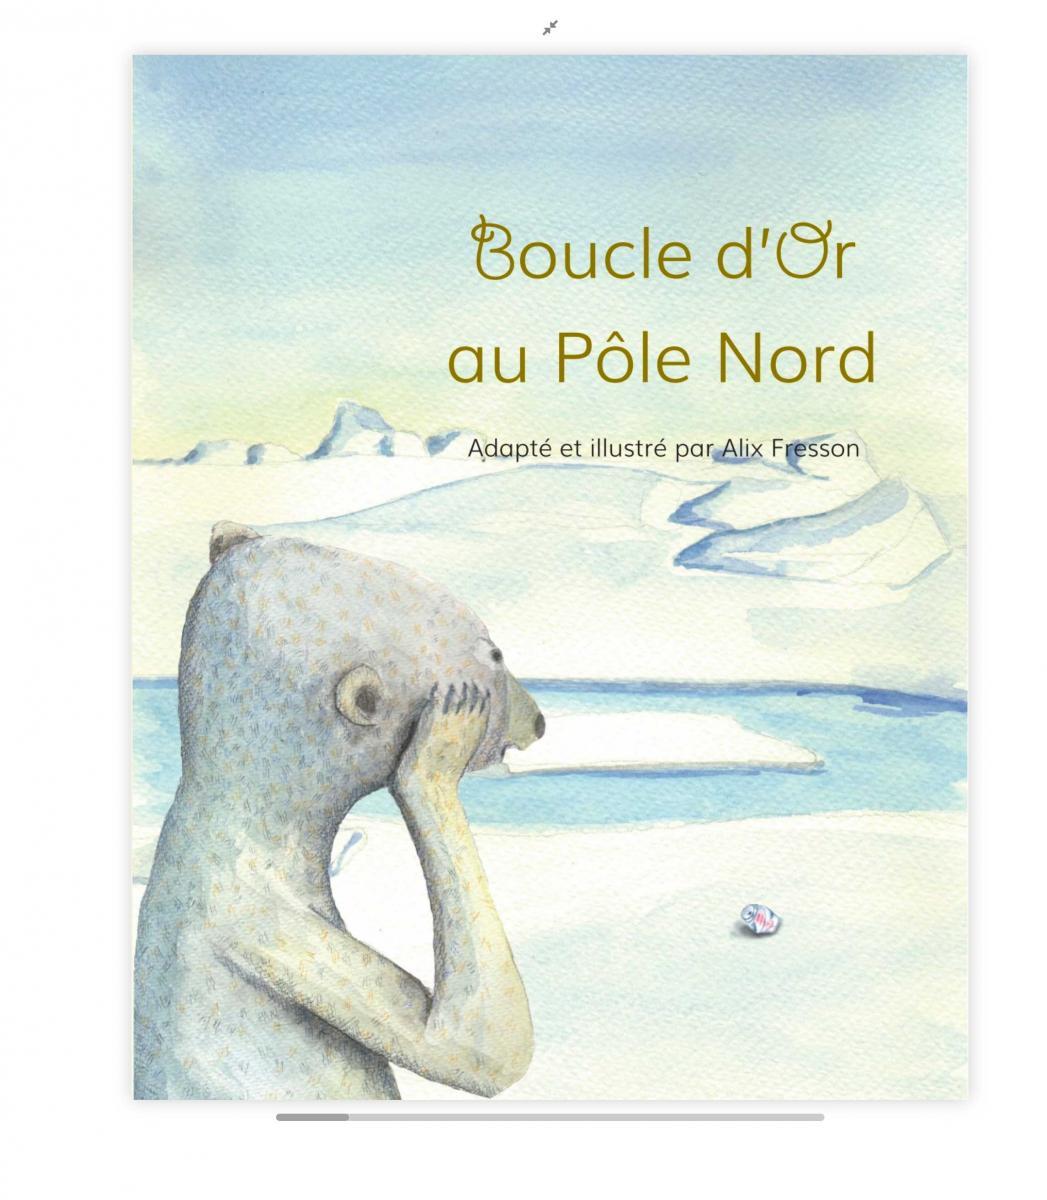 Boucle d'Or au Pôle Nord - cover